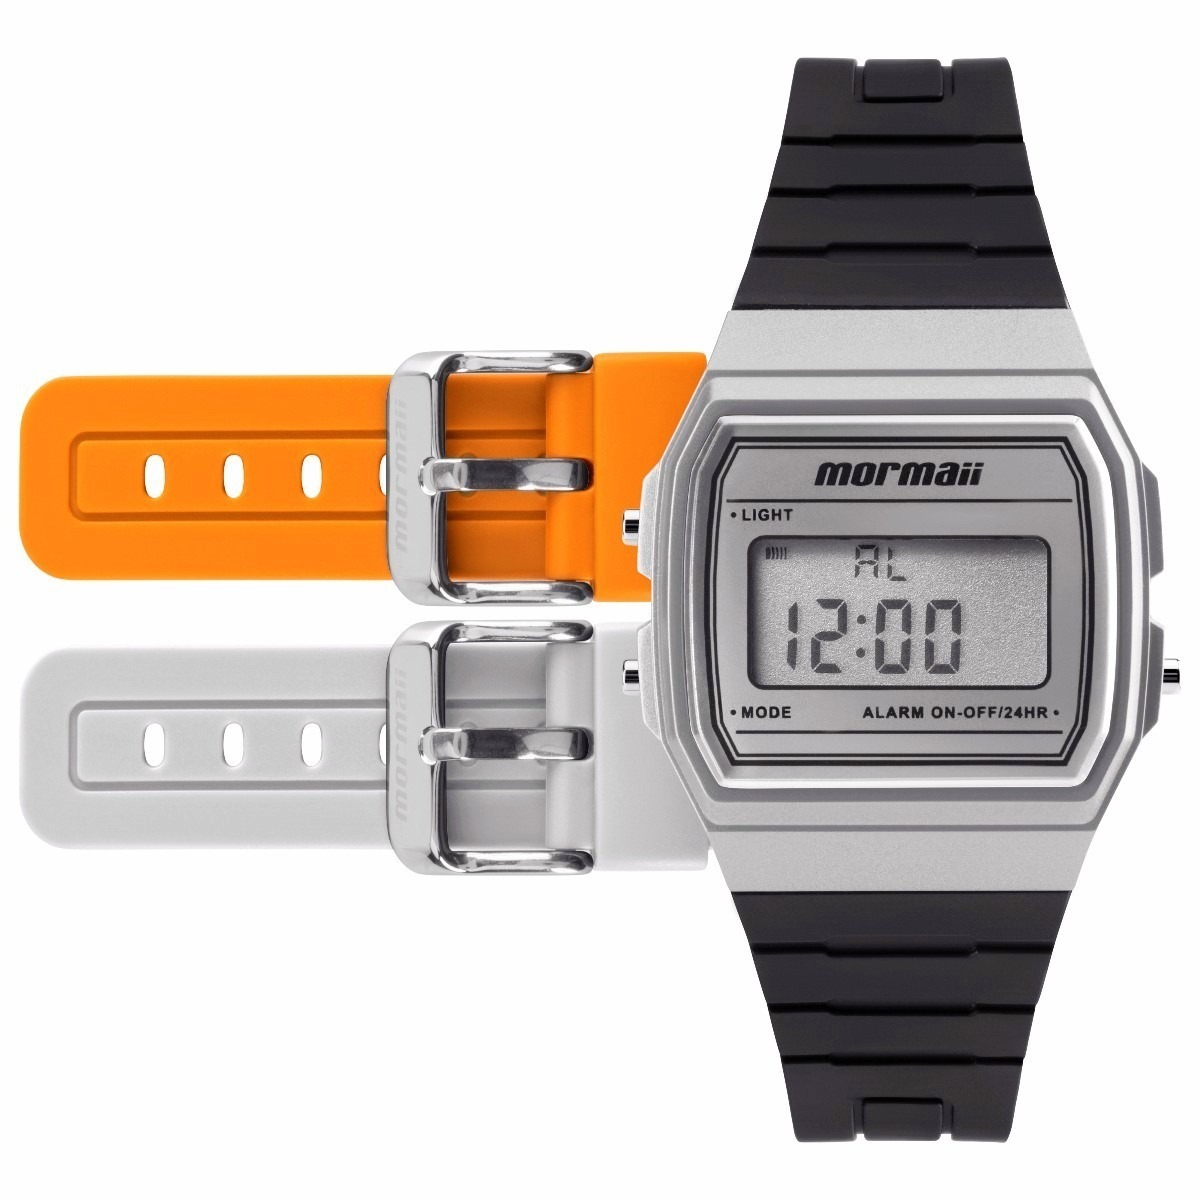 3d4e0b64a49d0 relógio mormaii mojh02ag 8k mojh02ag 8k troca fz pulseiras. Carregando zoom.